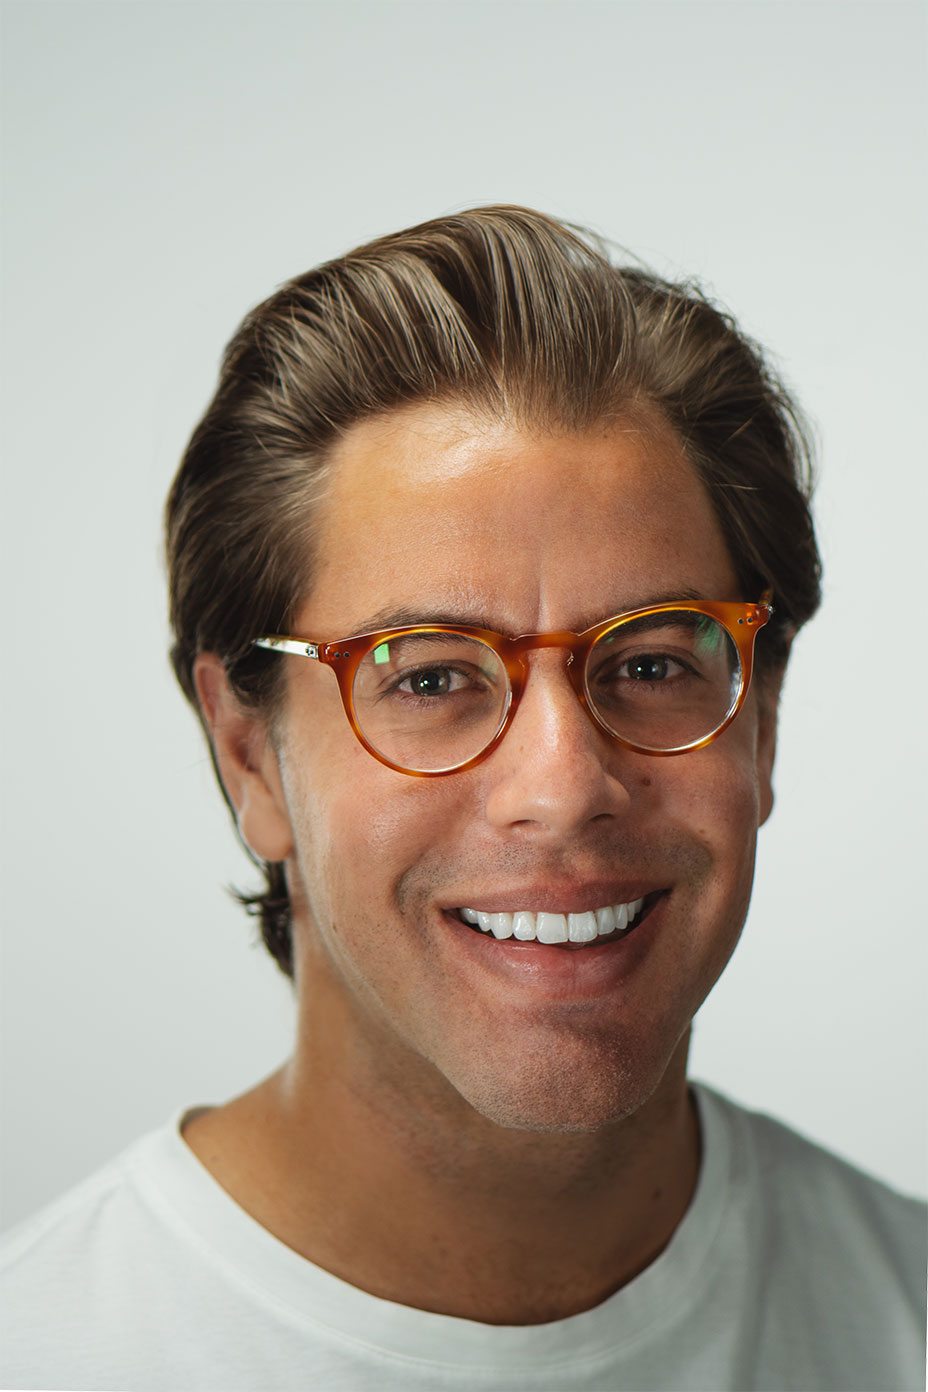 Portrait of Tim Dunkin, the Creative Director of Blodwen Audrey.